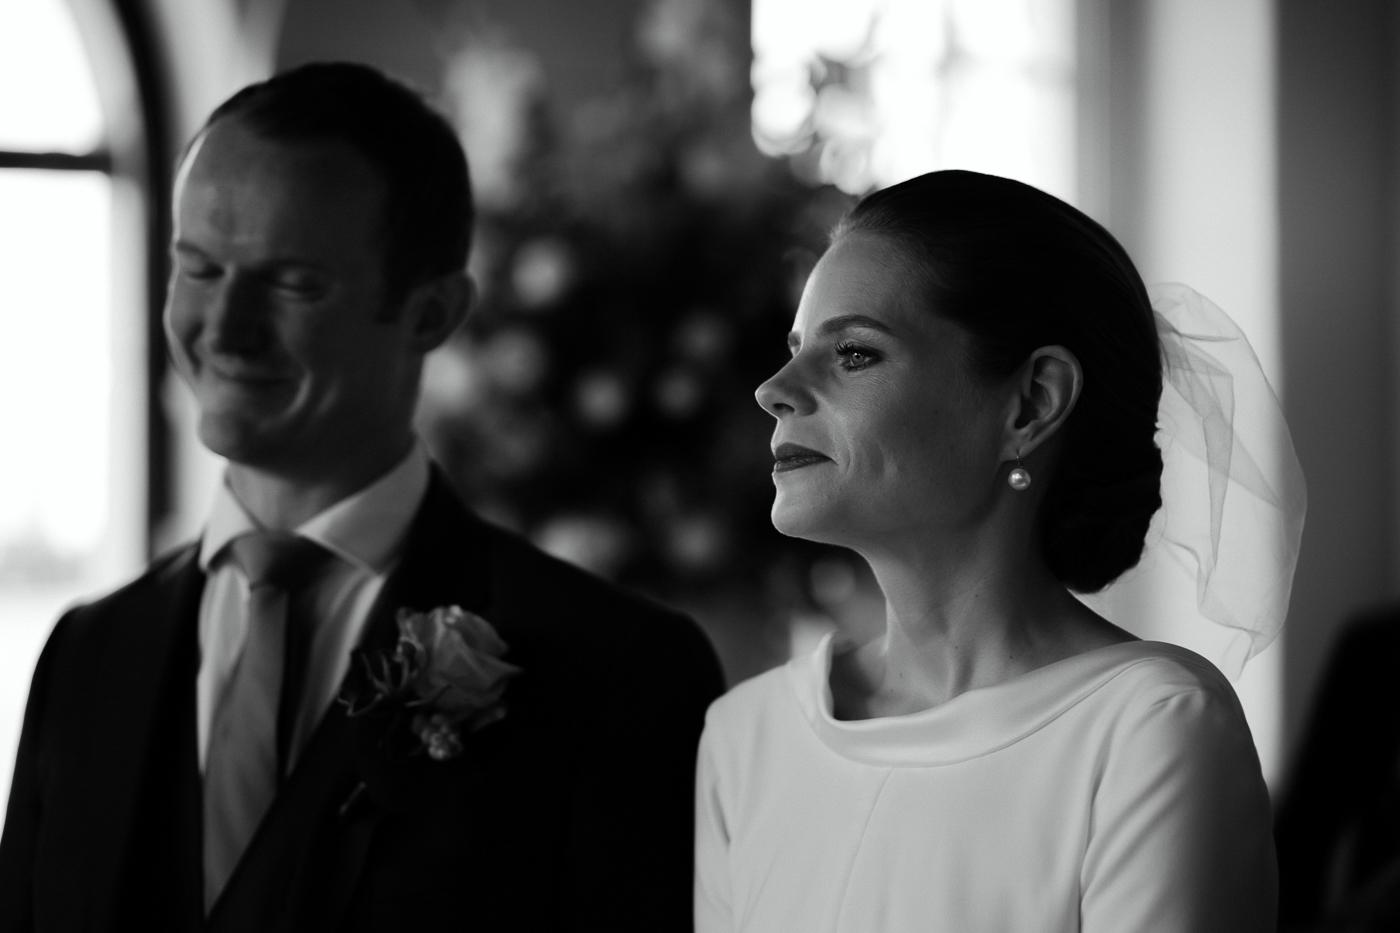 bruidsfotografie-trouwfotograaf-wedding-photographer-amsterdam-James-Jantine-170-2.jpg